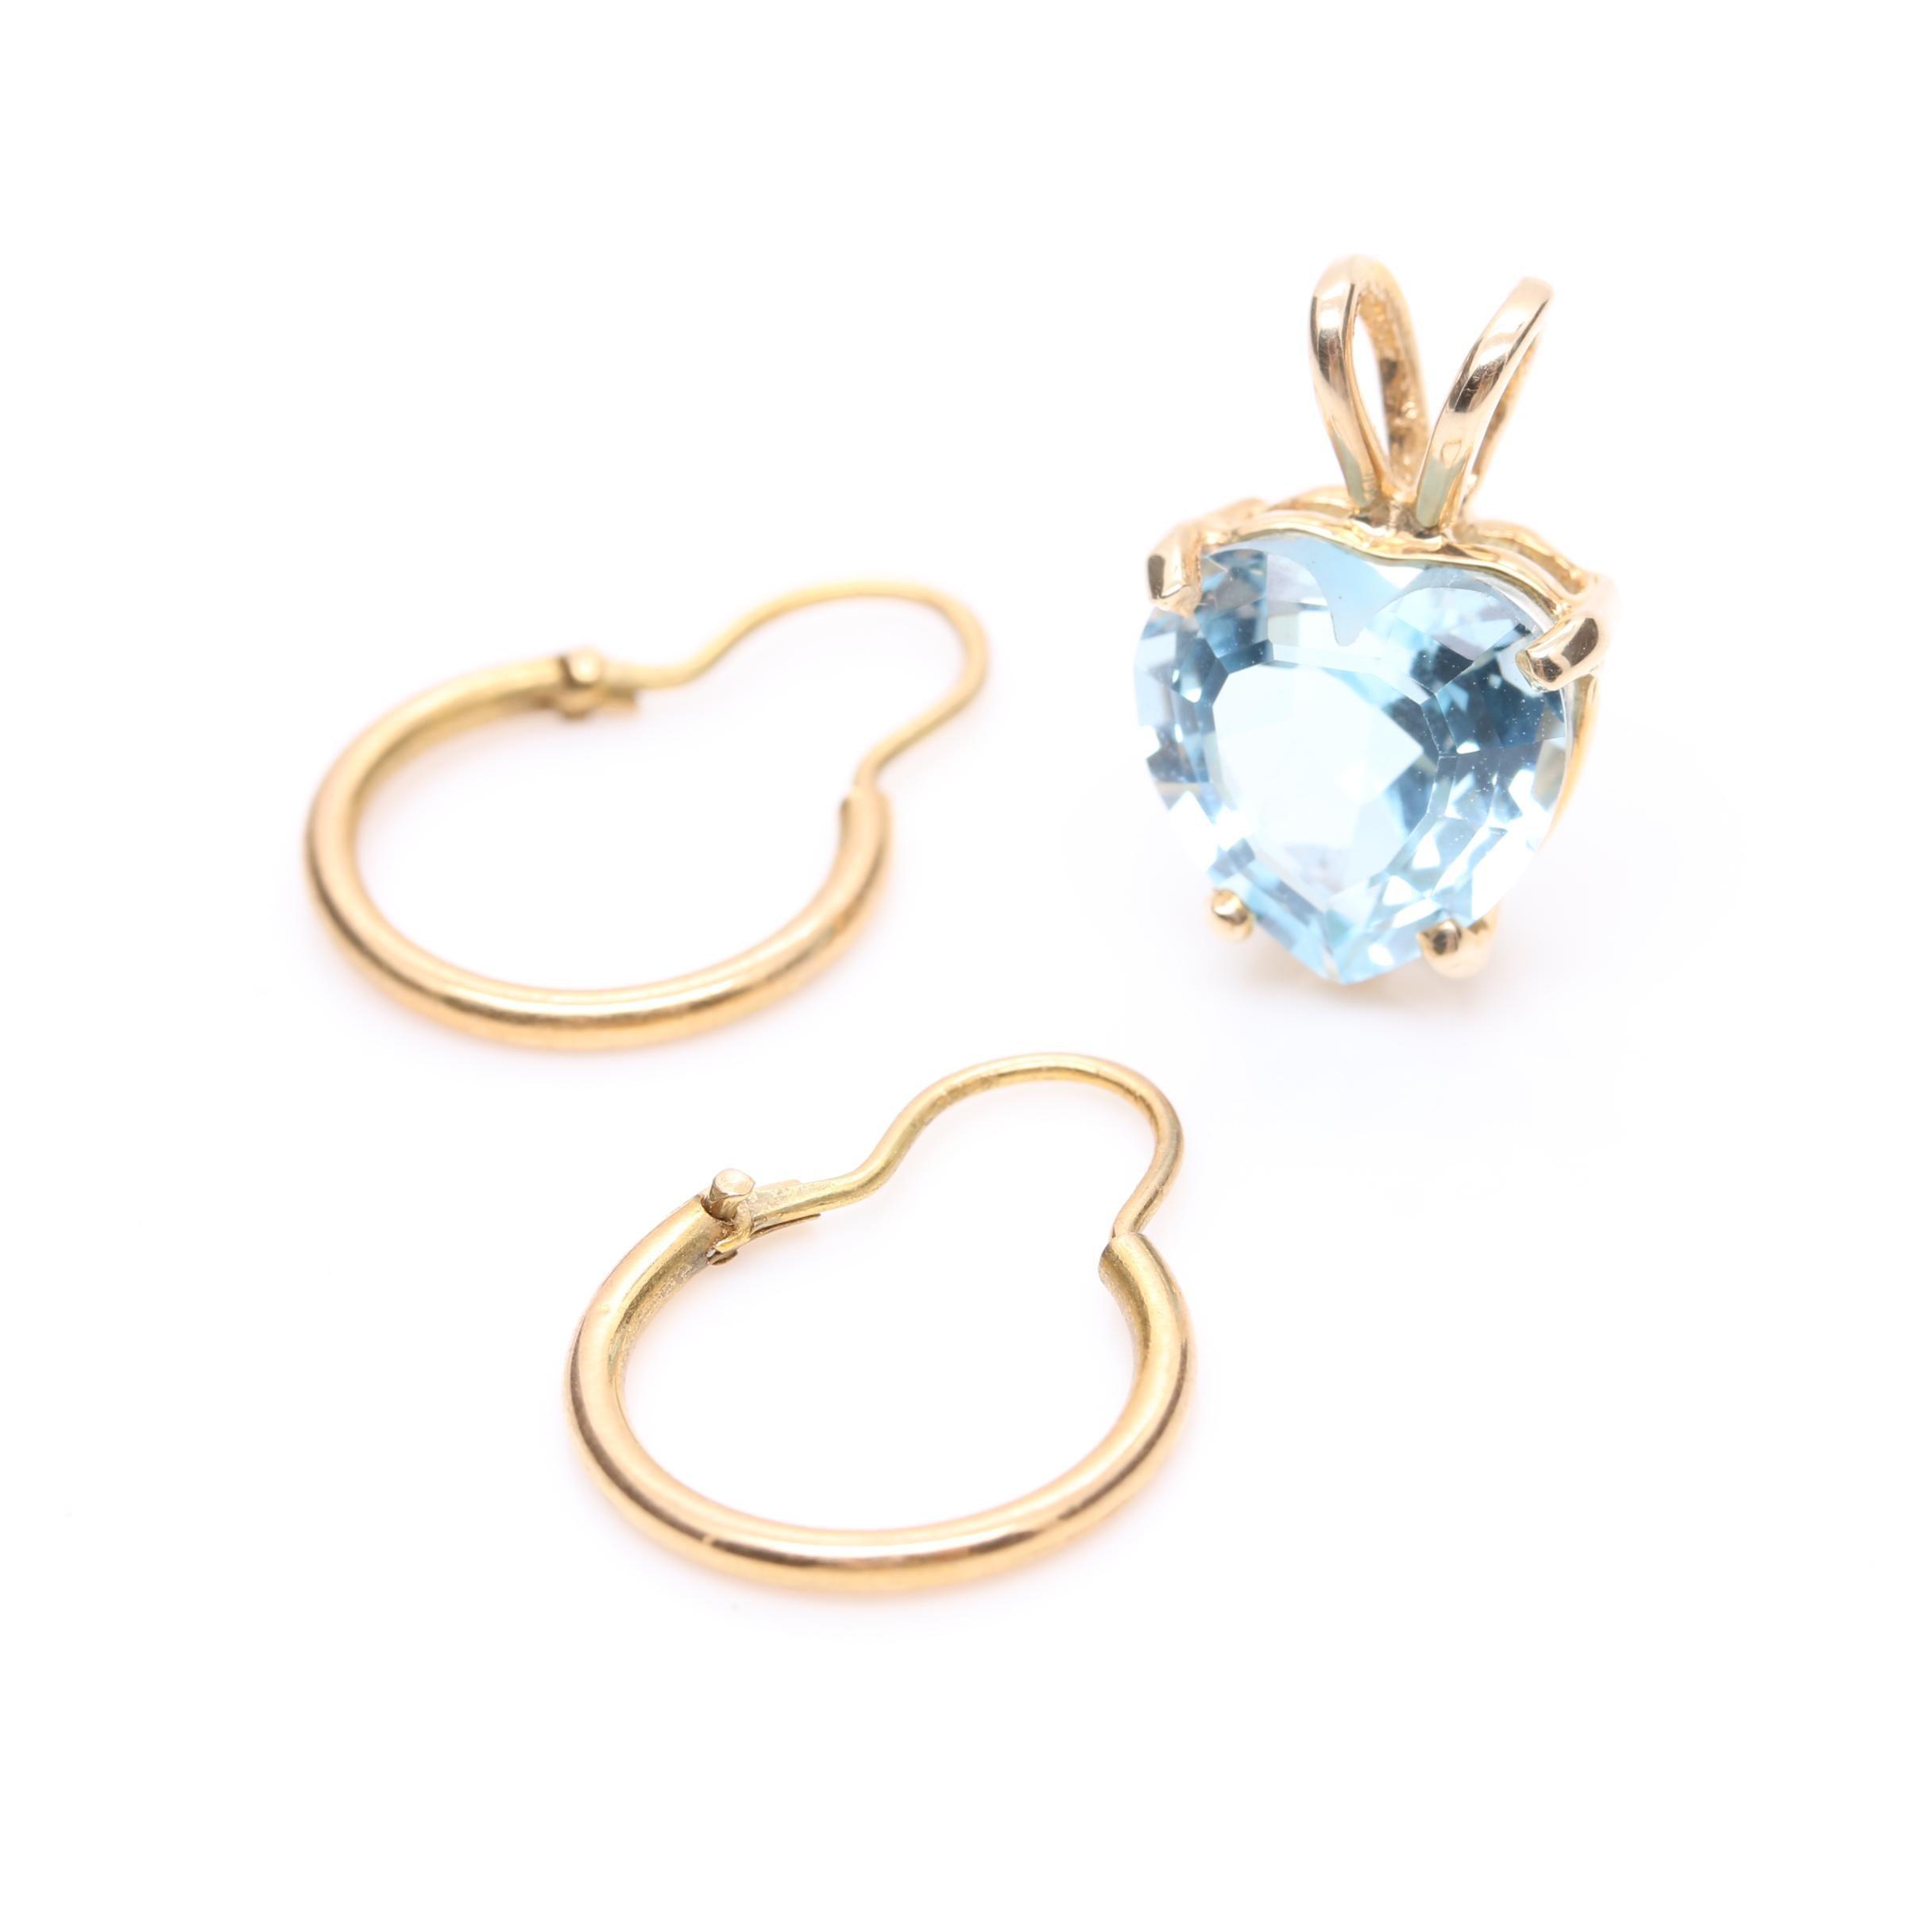 14K Yellow Gold Blue Topaz Heart Pendant and 18K Yellow Gold Hoop Earrings